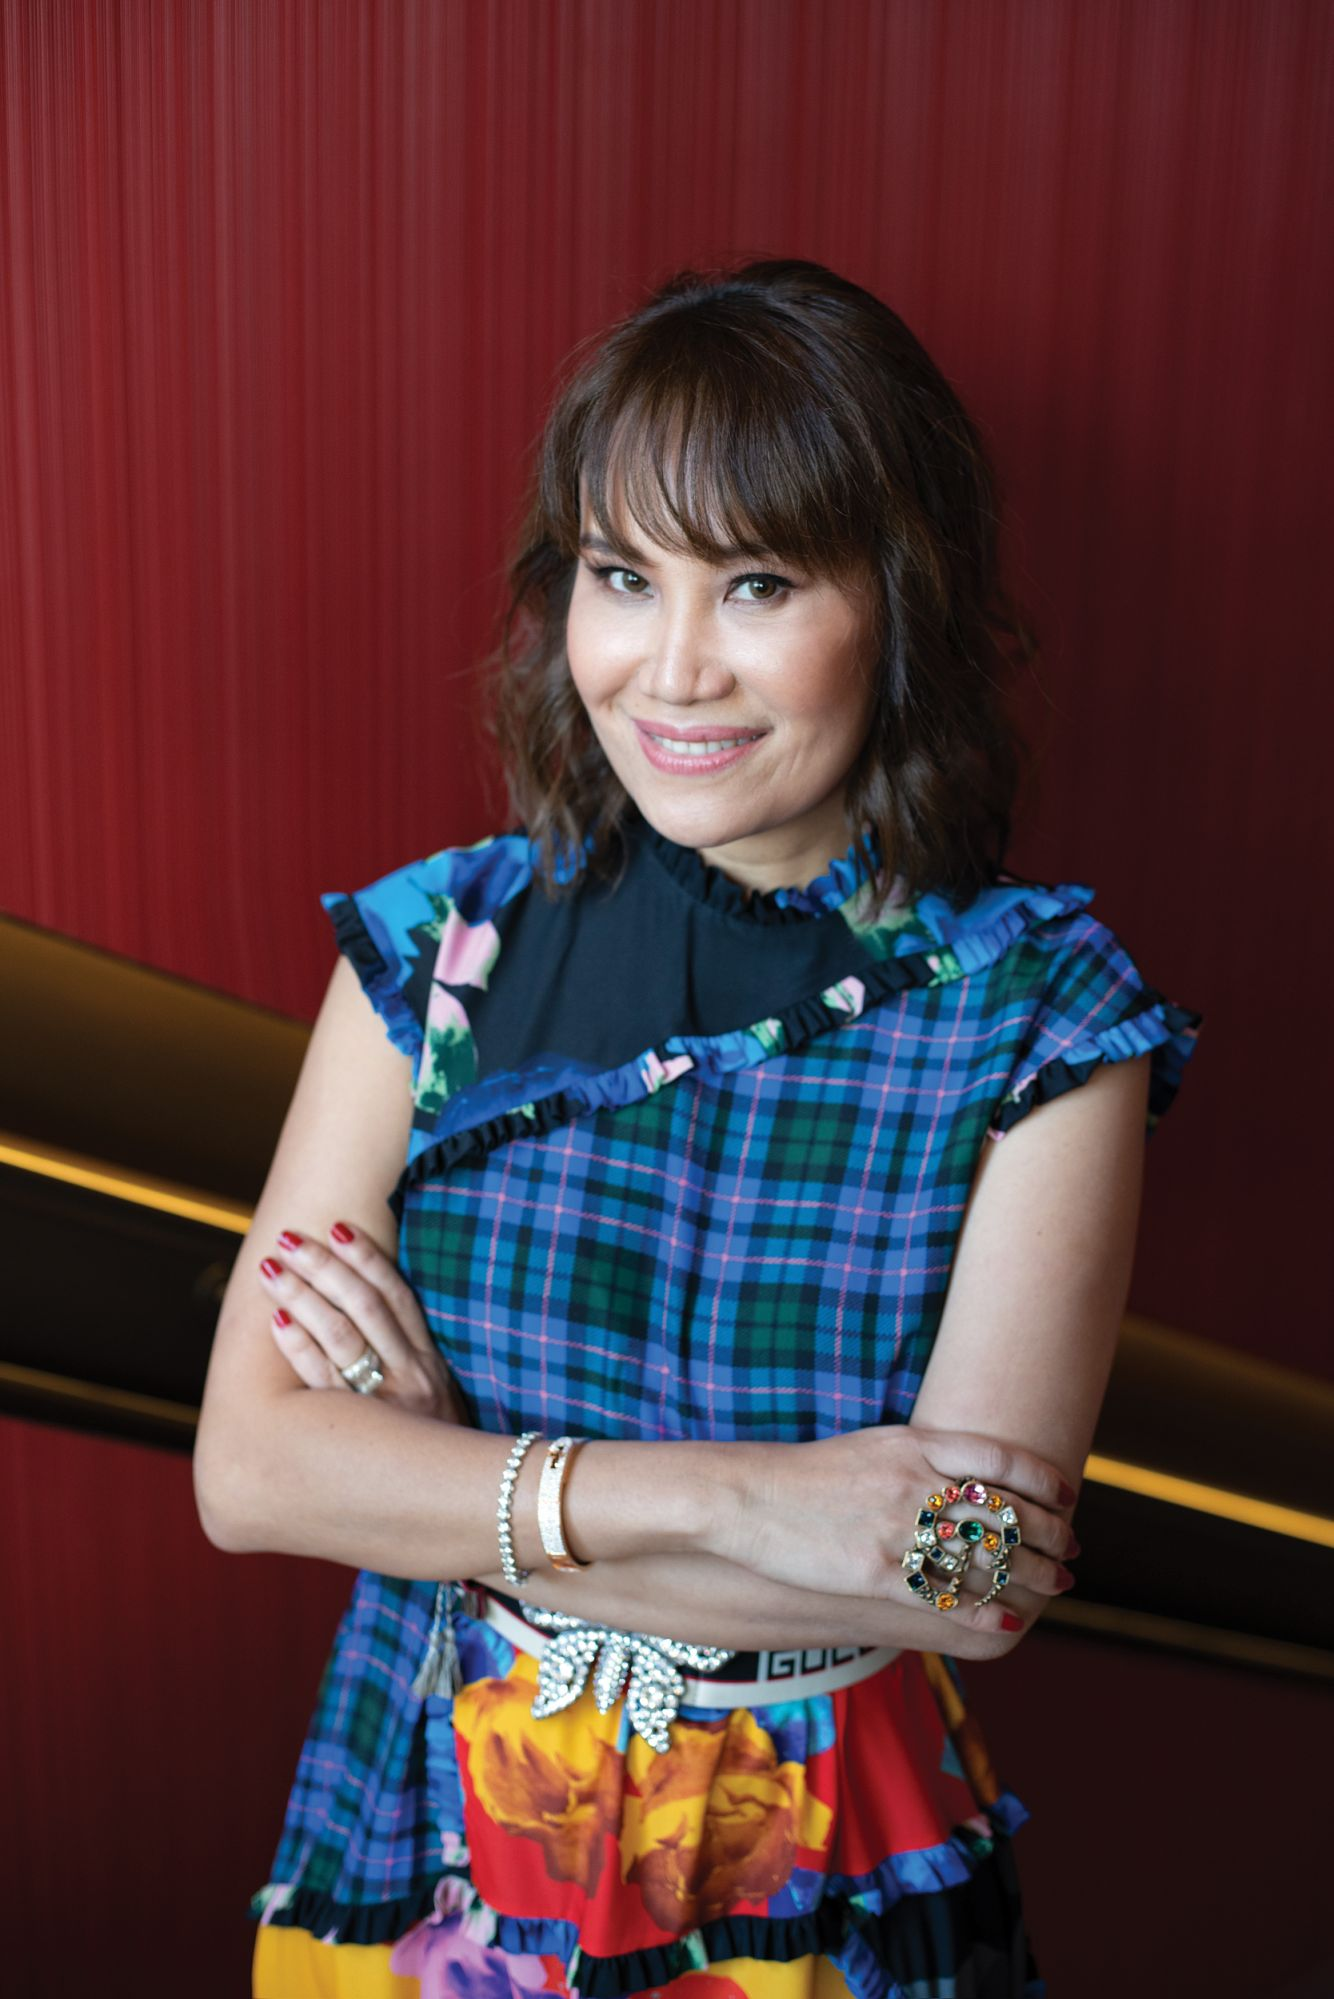 Style Profile: Dr. Aivee Teo